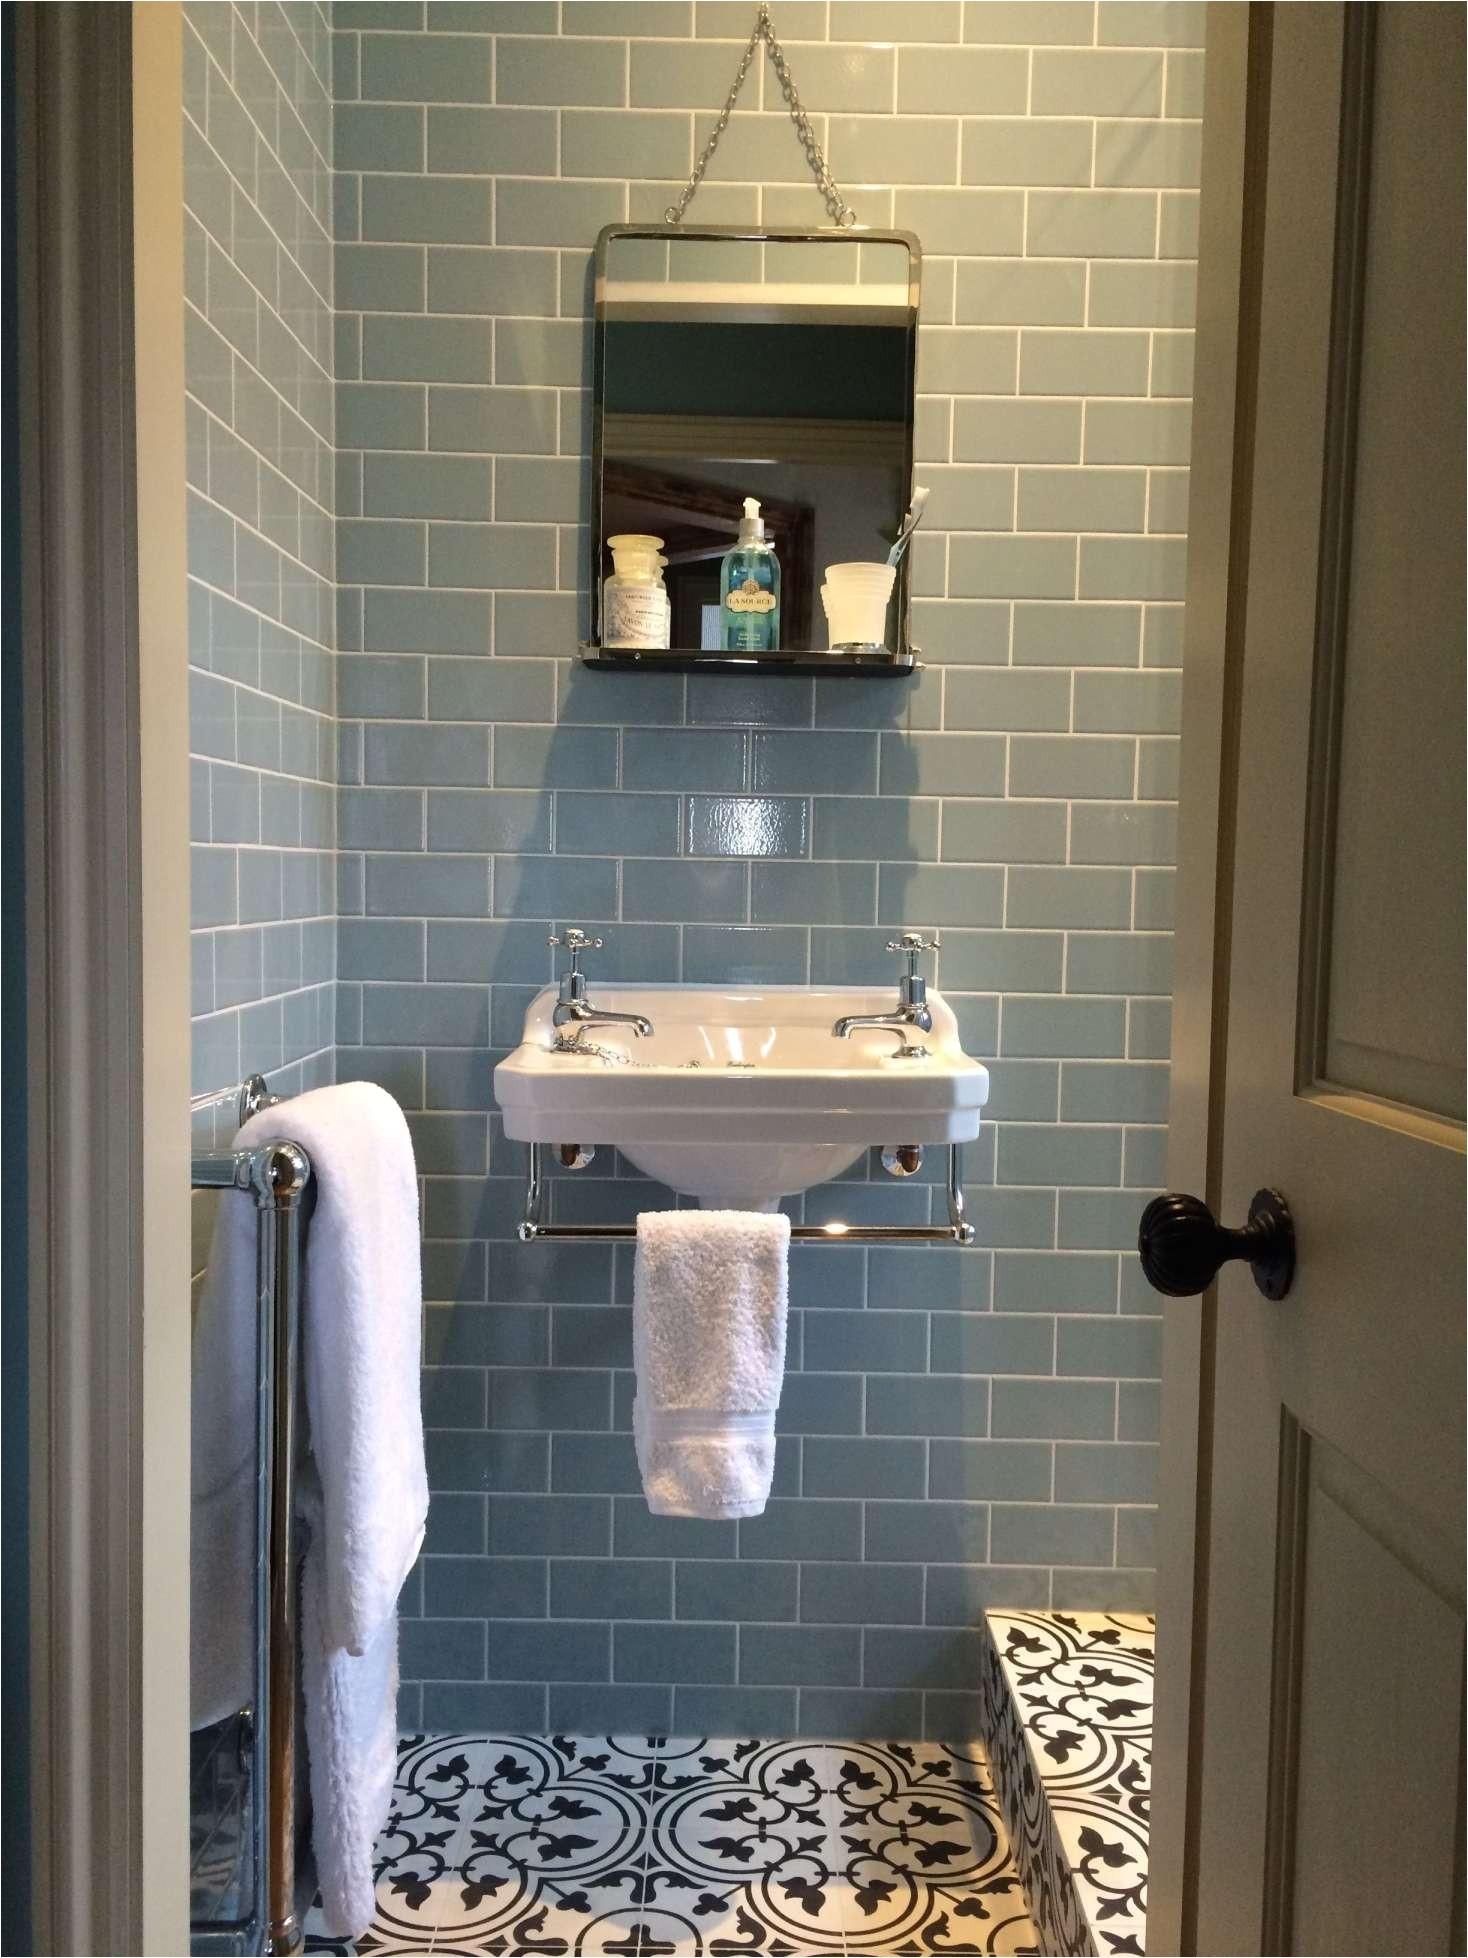 Designer Bathroom Tile Best Bathroom Floor Tile Design Ideas New Floor Tiles Mosaic Bathroom 0d